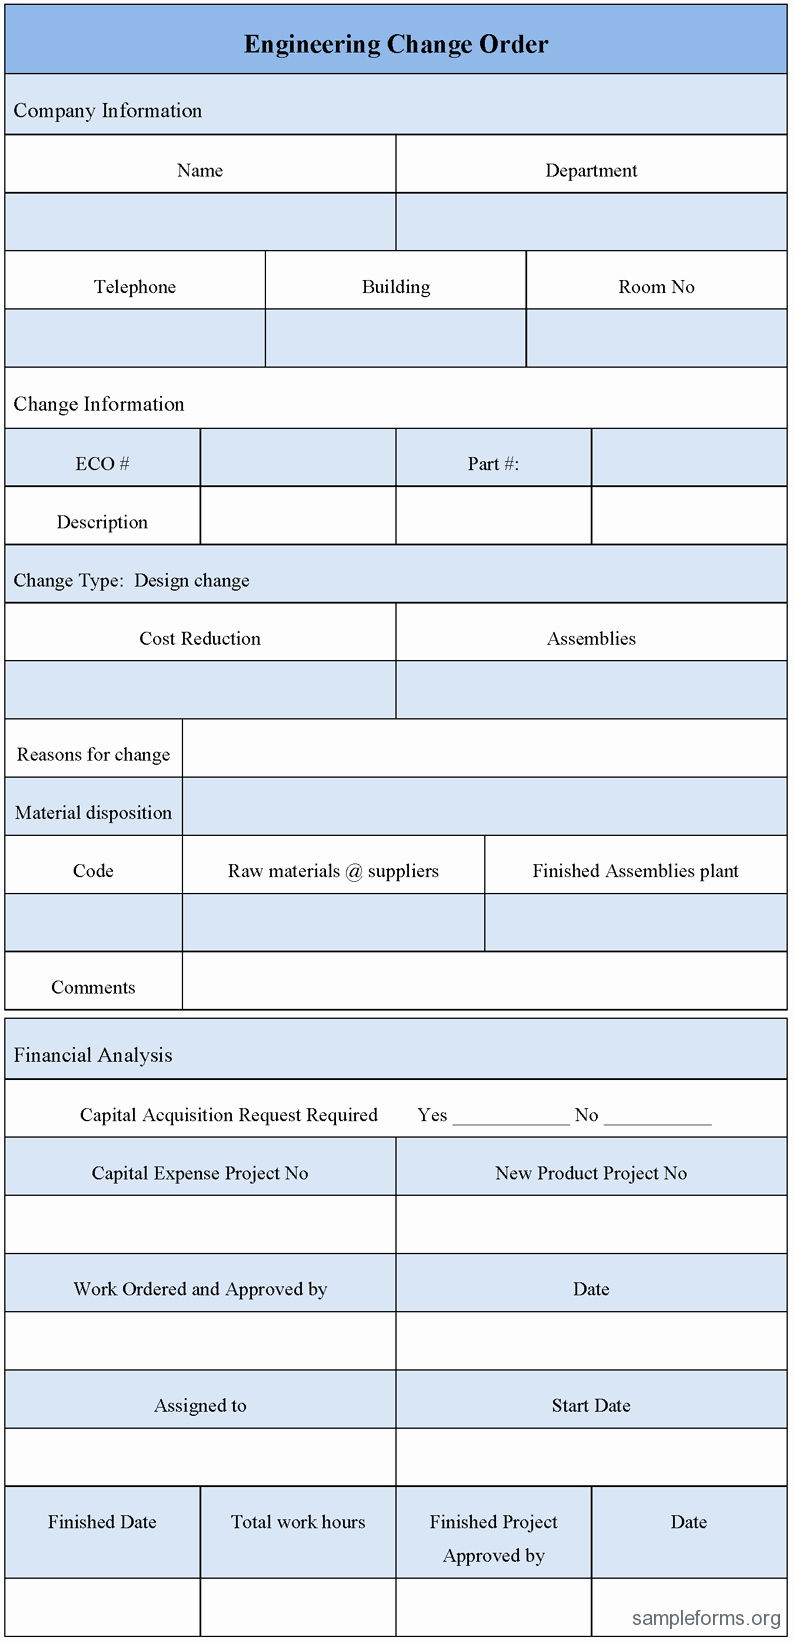 Engineering Change order form Sample forms